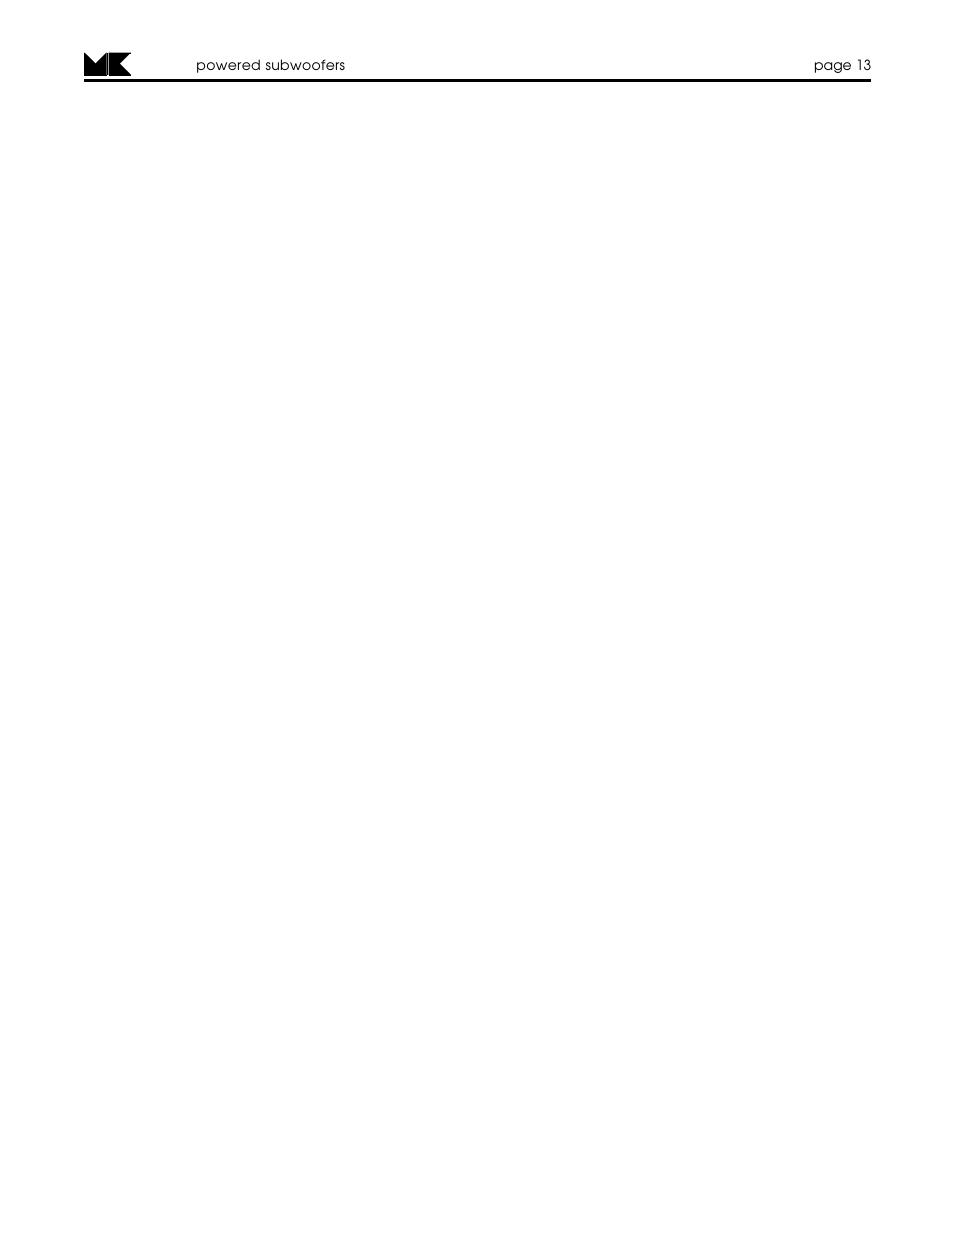 MK Sound MX-125 MK II User Manual | Page 13 / 16 | Also for: VX-7 MK